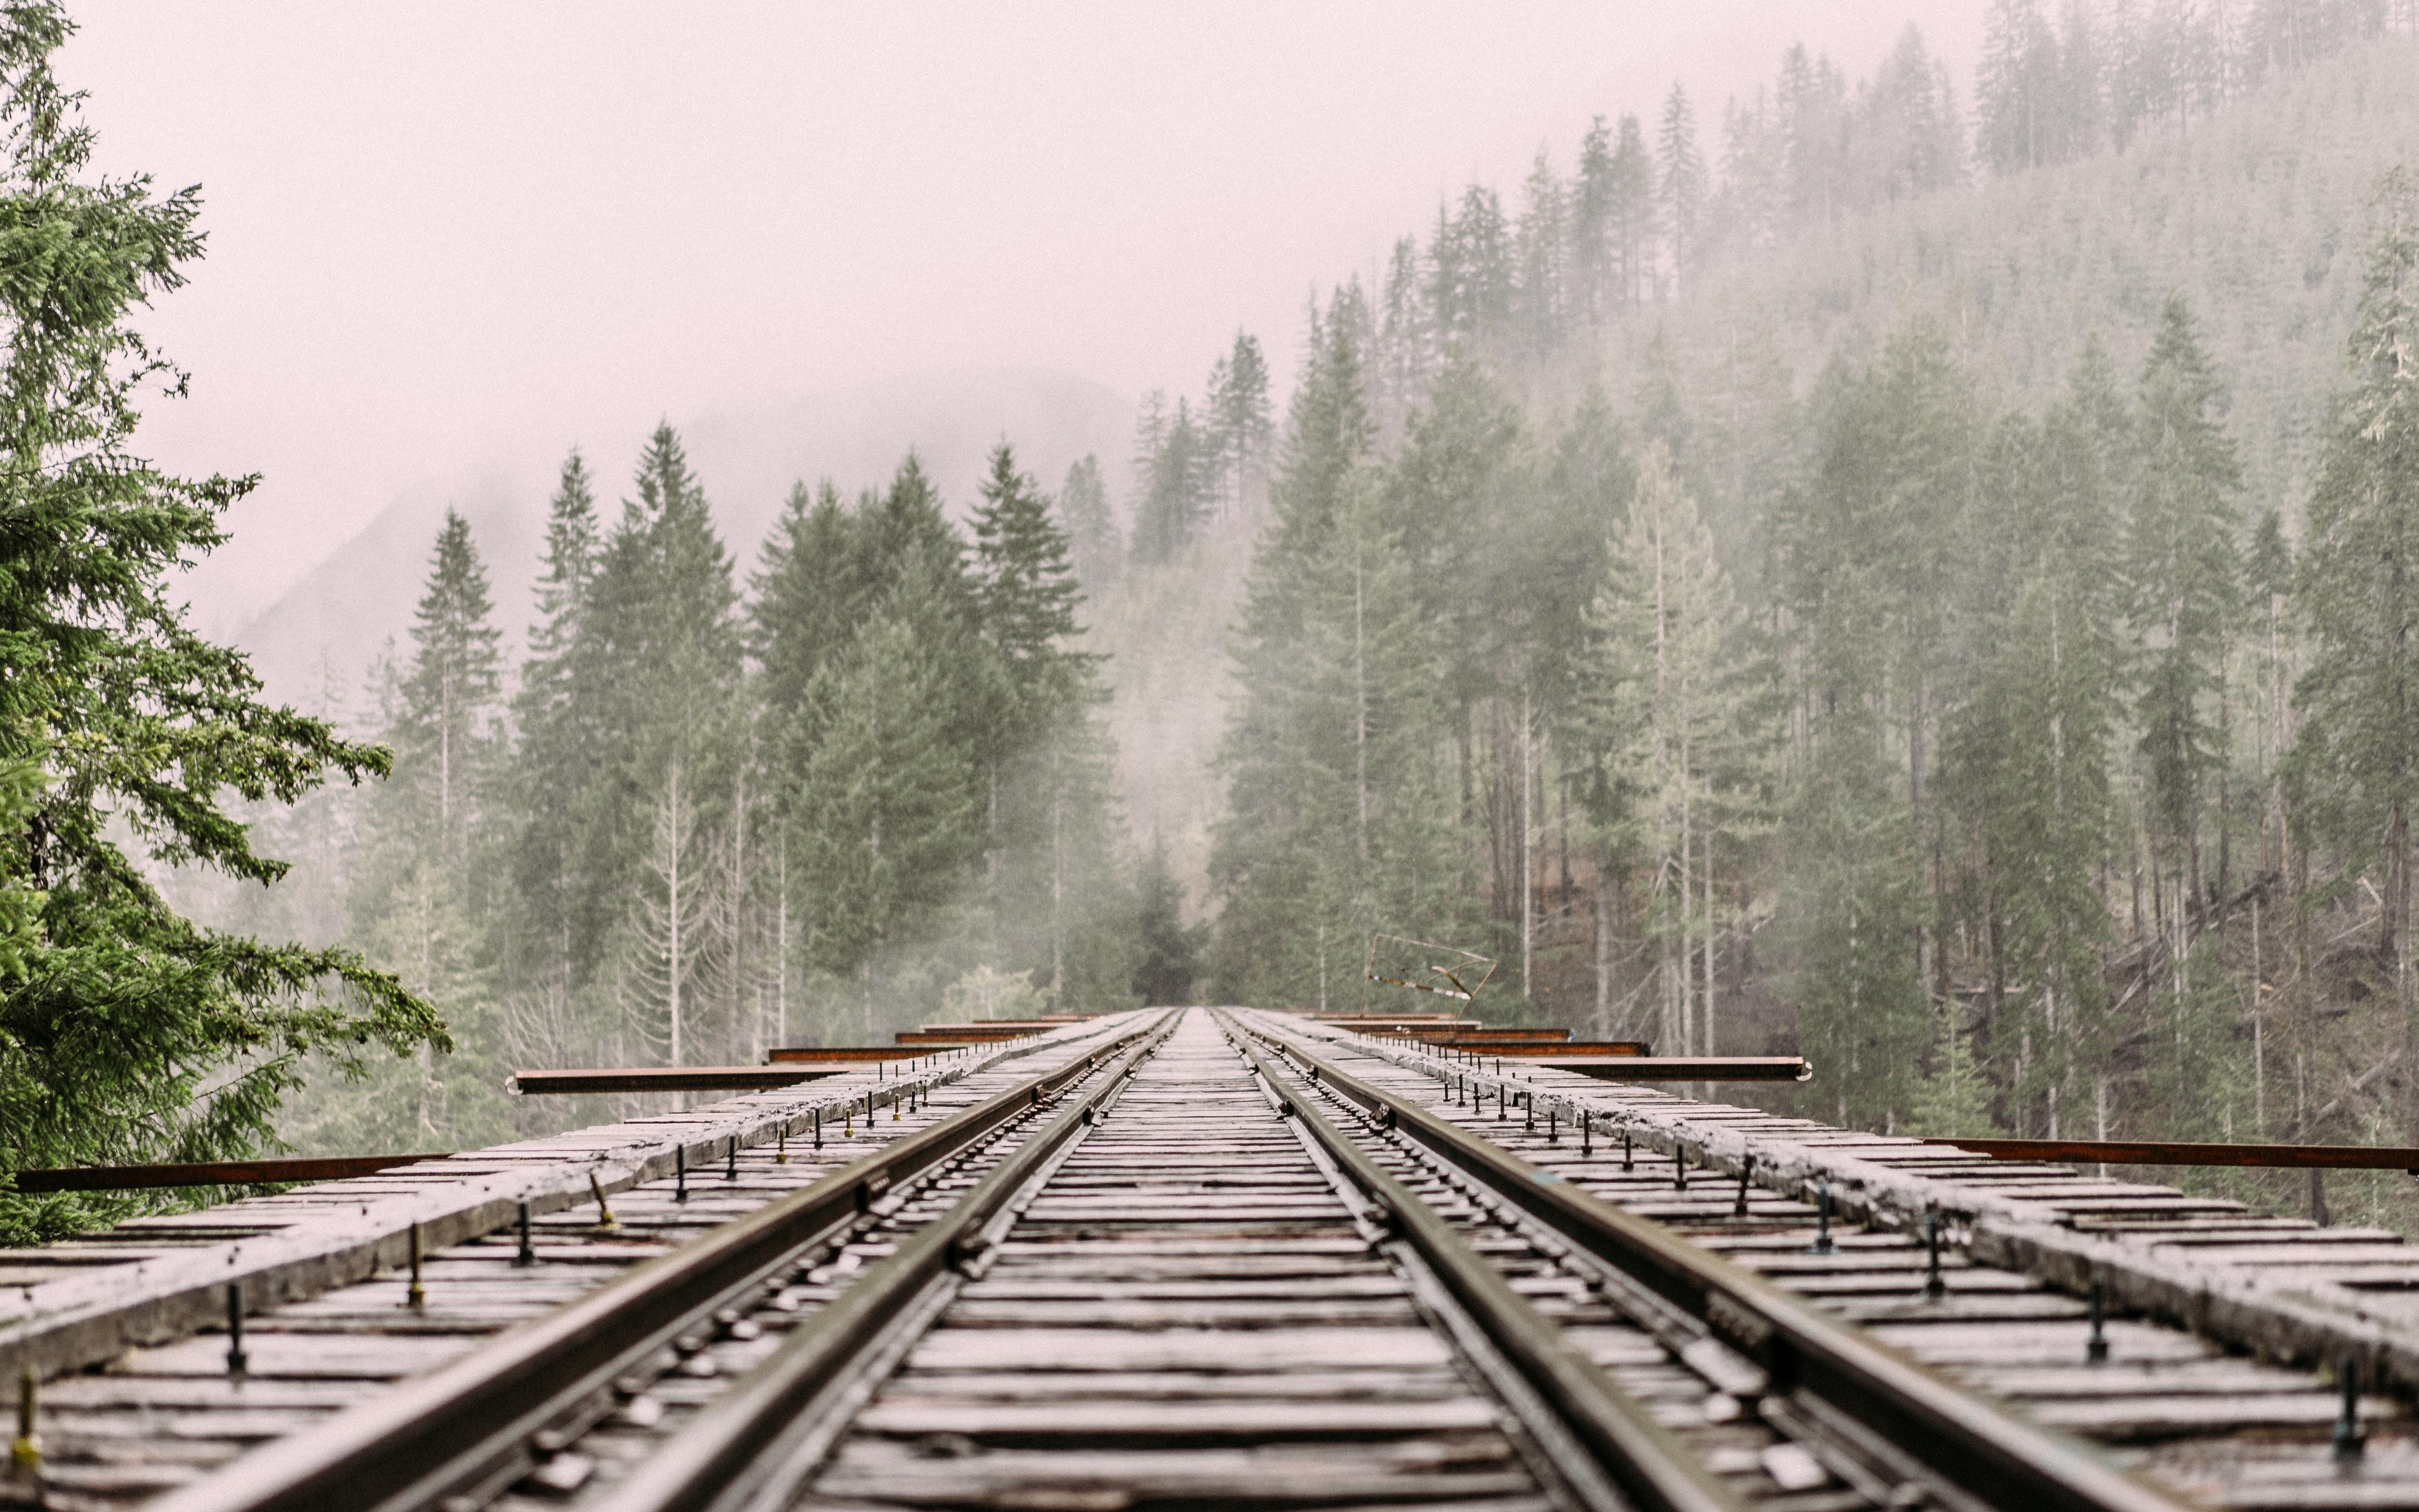 gray steel train rails